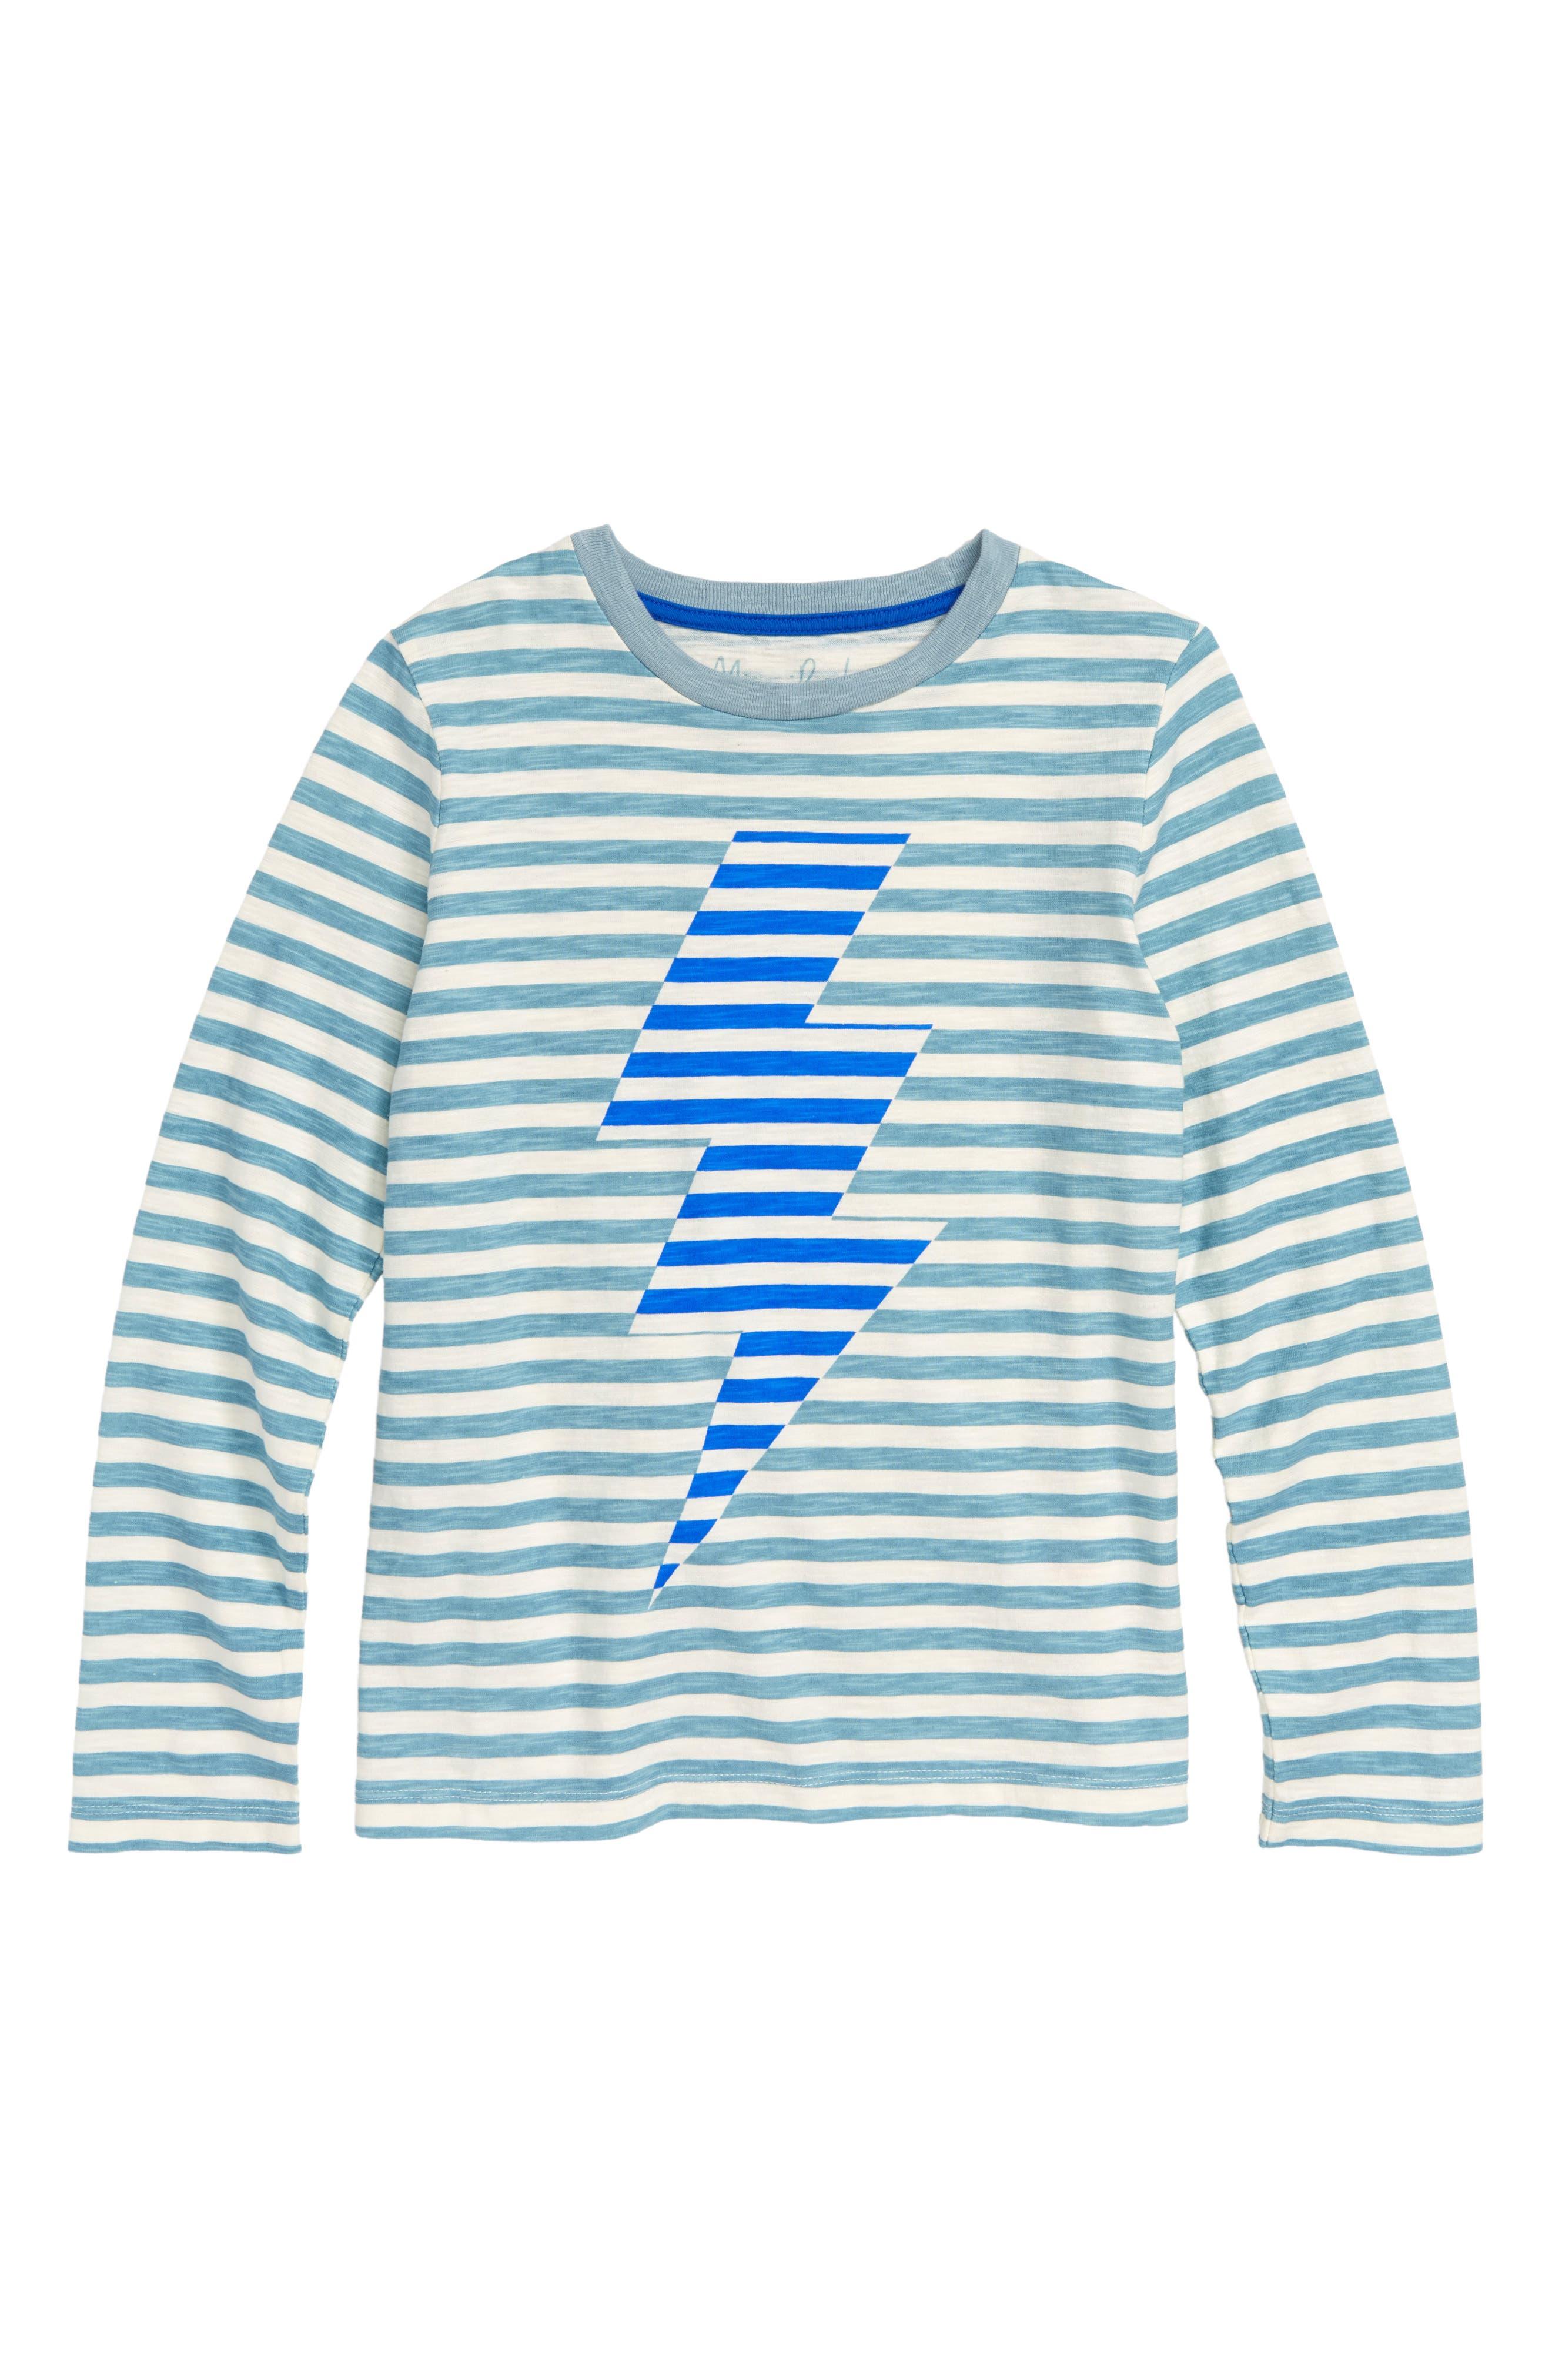 Stripy Bolt Icon T-Shirt,                         Main,                         color, DOLPHIN BLUE/ ECRU